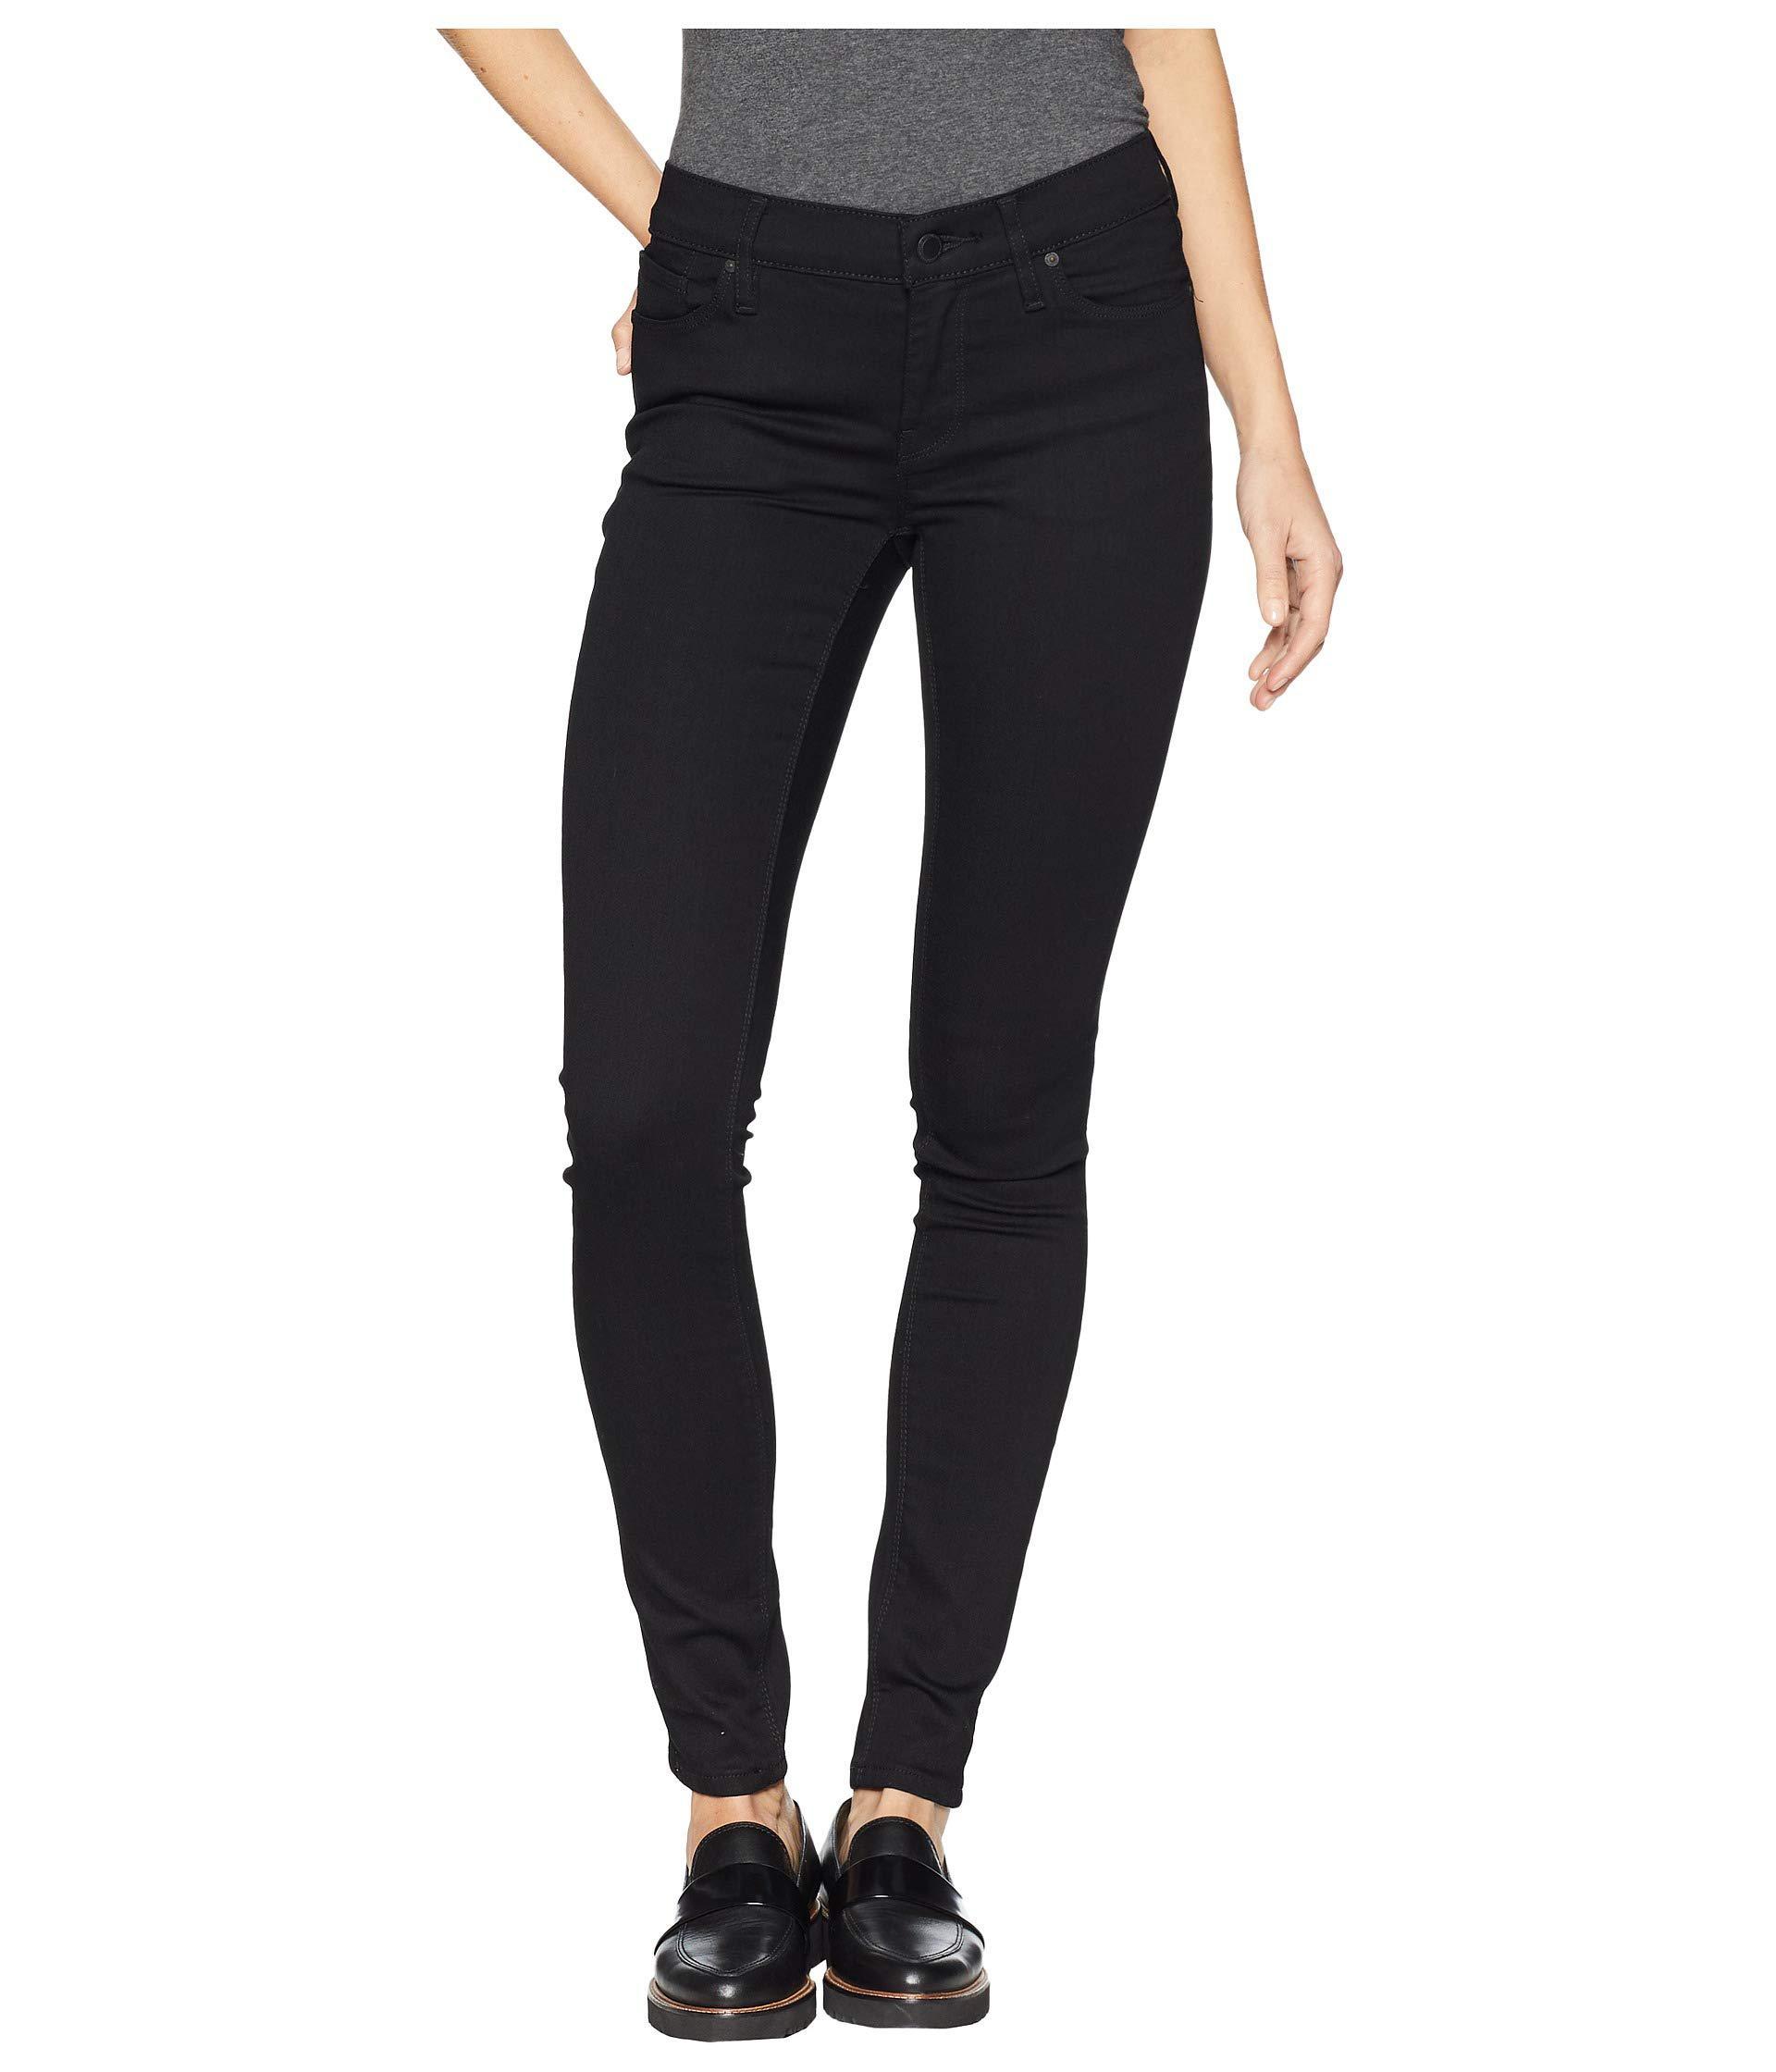 013f0da43fc Lyst - Hudson Jeans Krista Super Skinny Jeans In Black (black ...